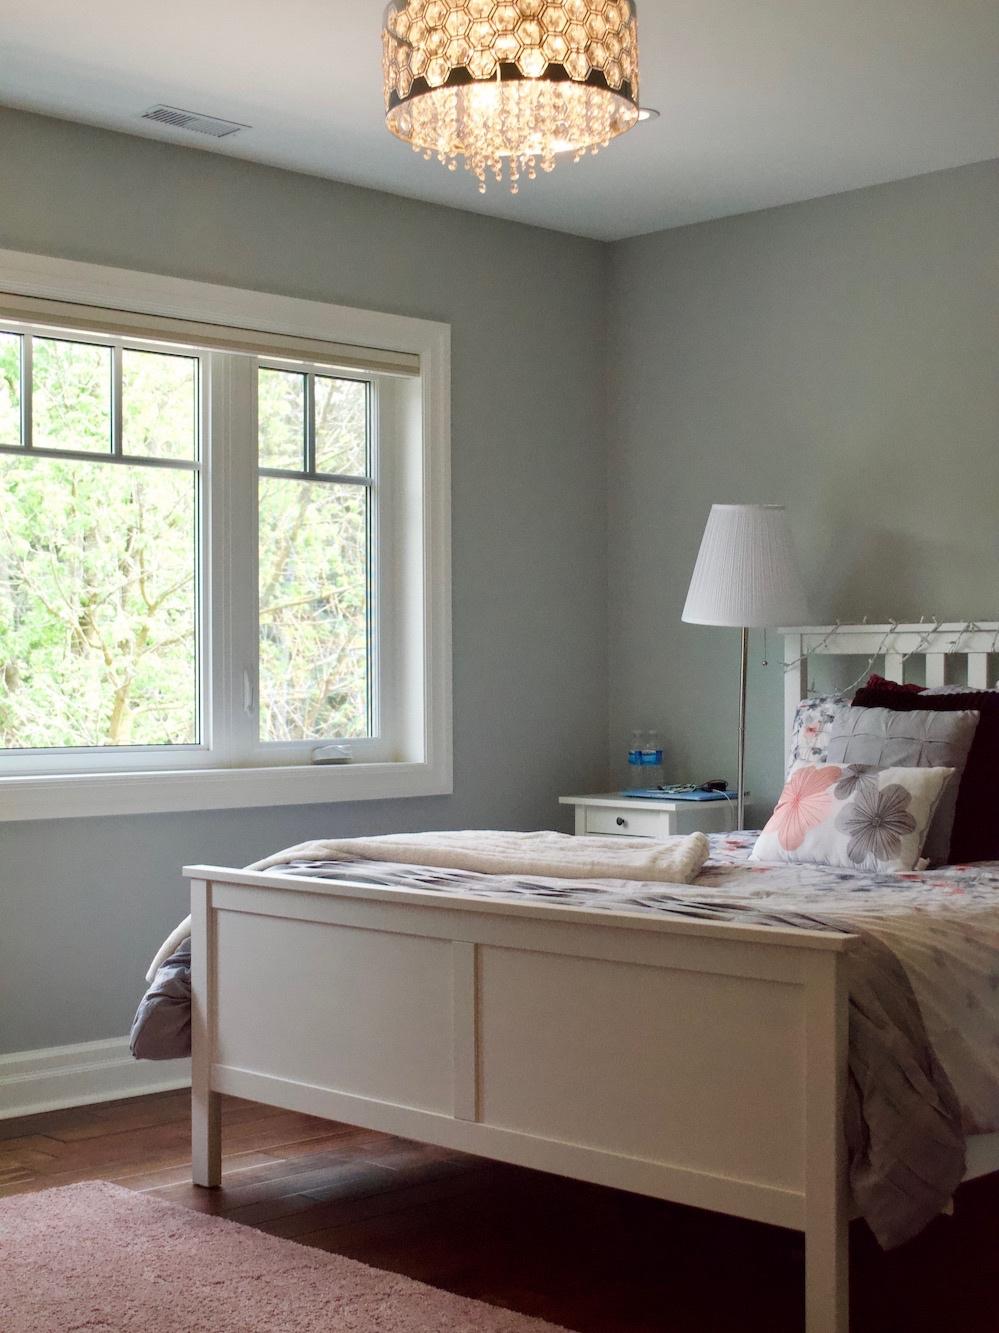 bedroom+window+grills+2nd+storey+addition.jpg